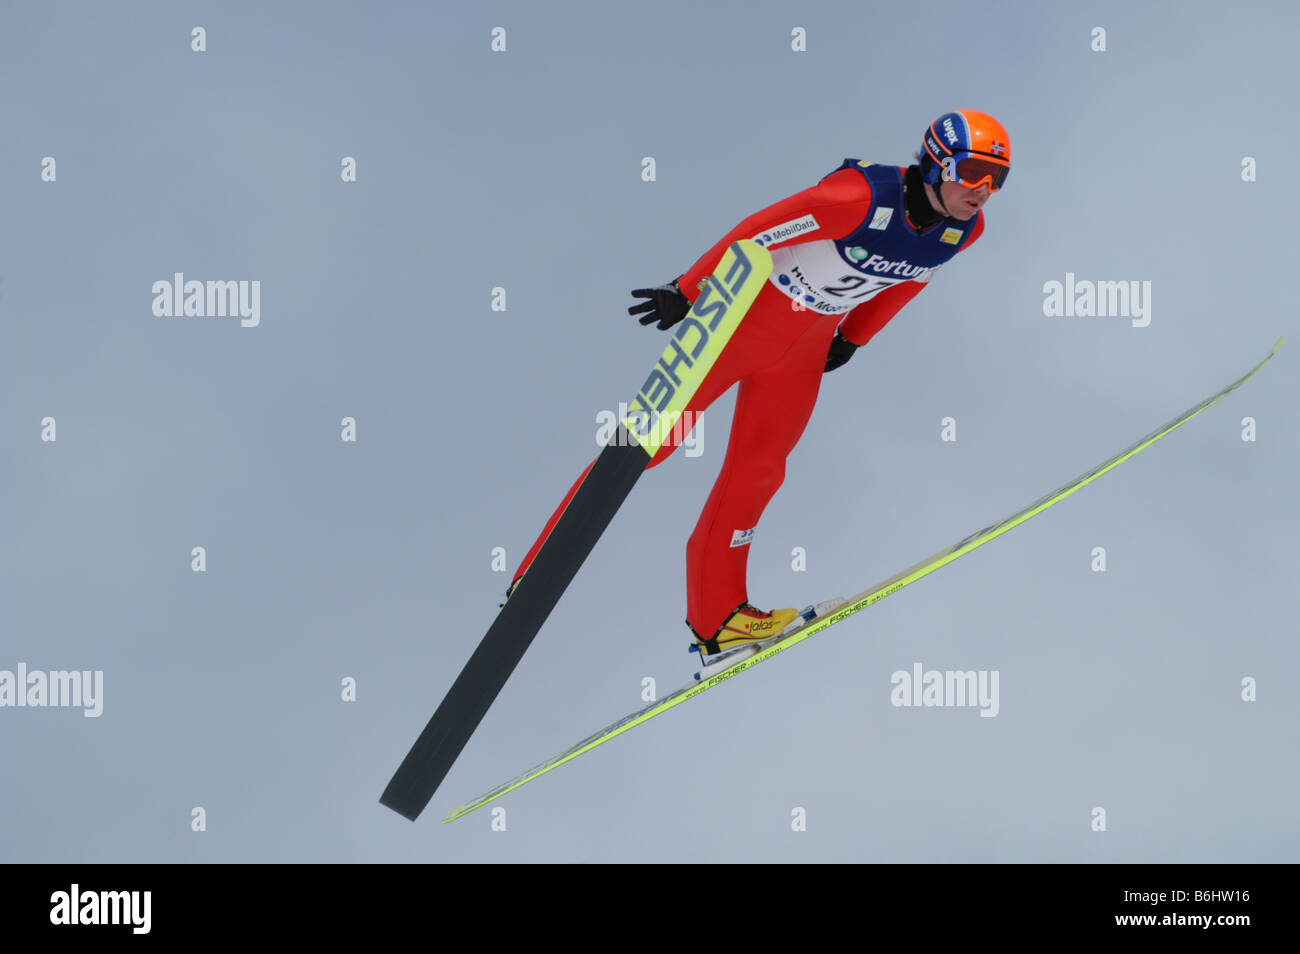 Nordic Combined World Cup,Holmenkollen, Norway - Stock Image